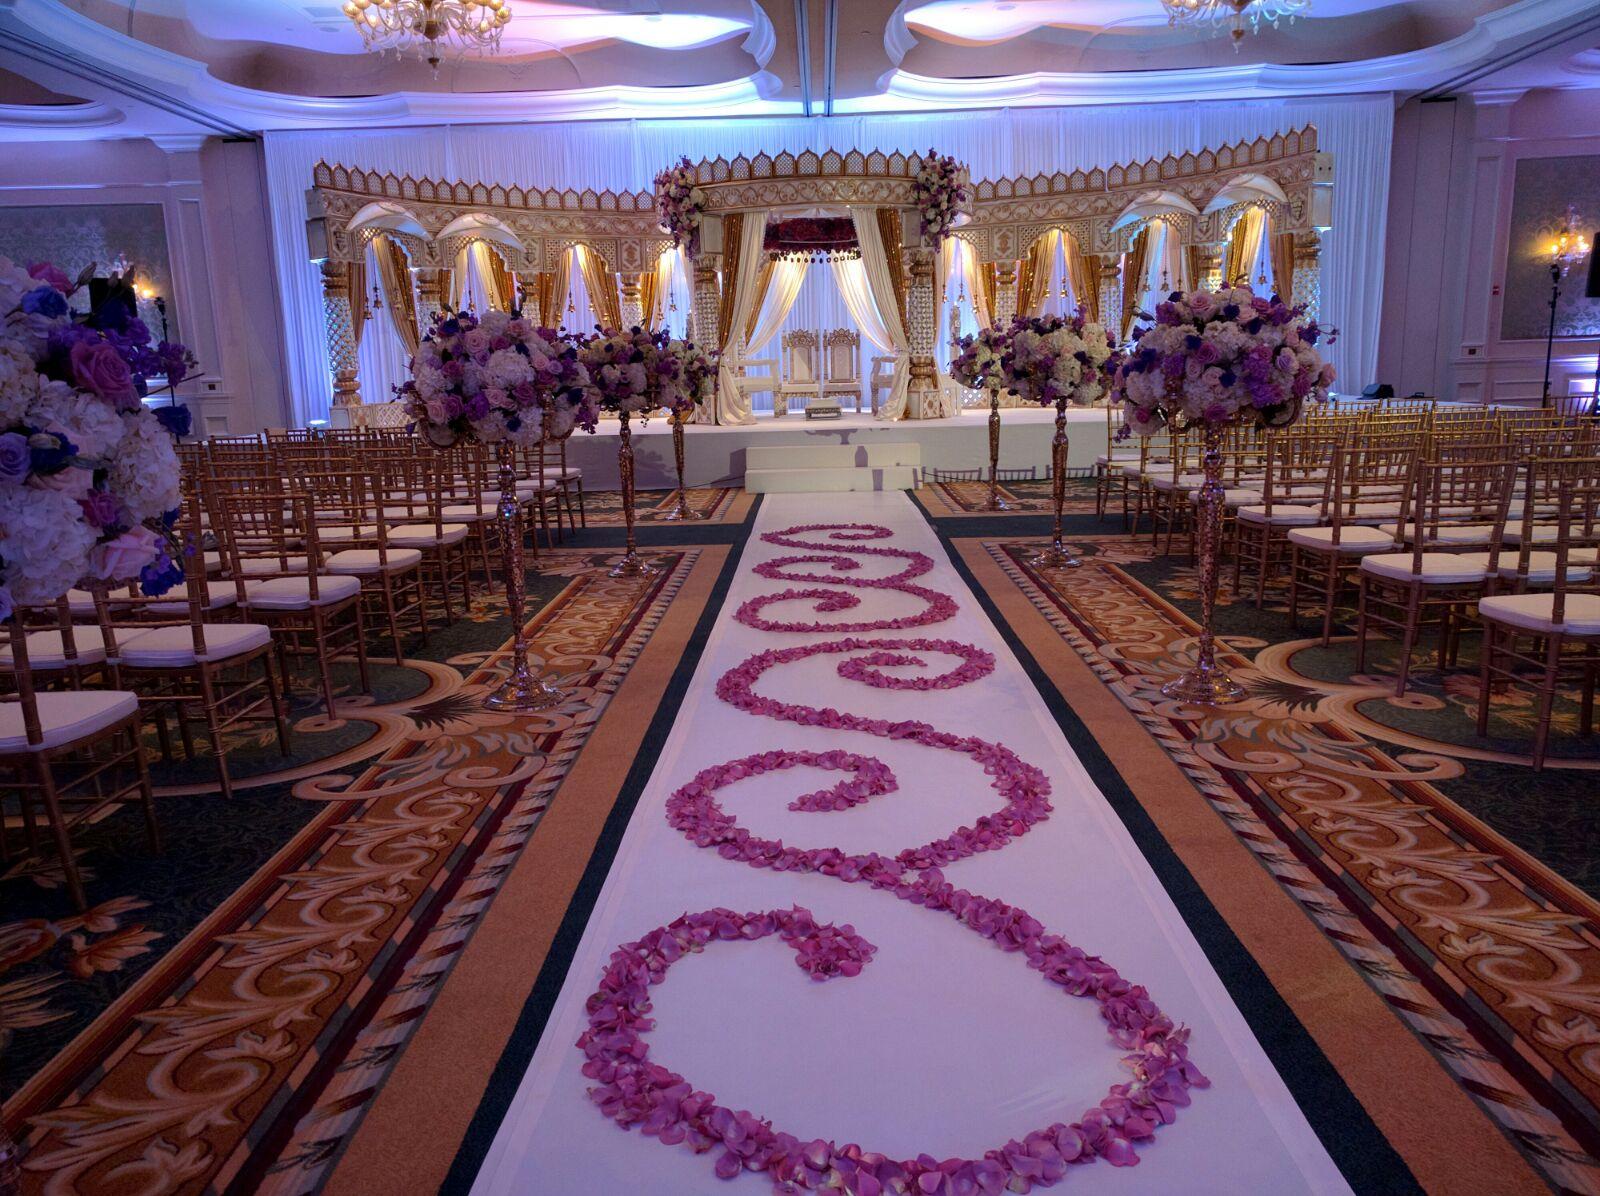 http://weddingmandaps.us/assets/wedding-stage-mandaps-themes.jpg